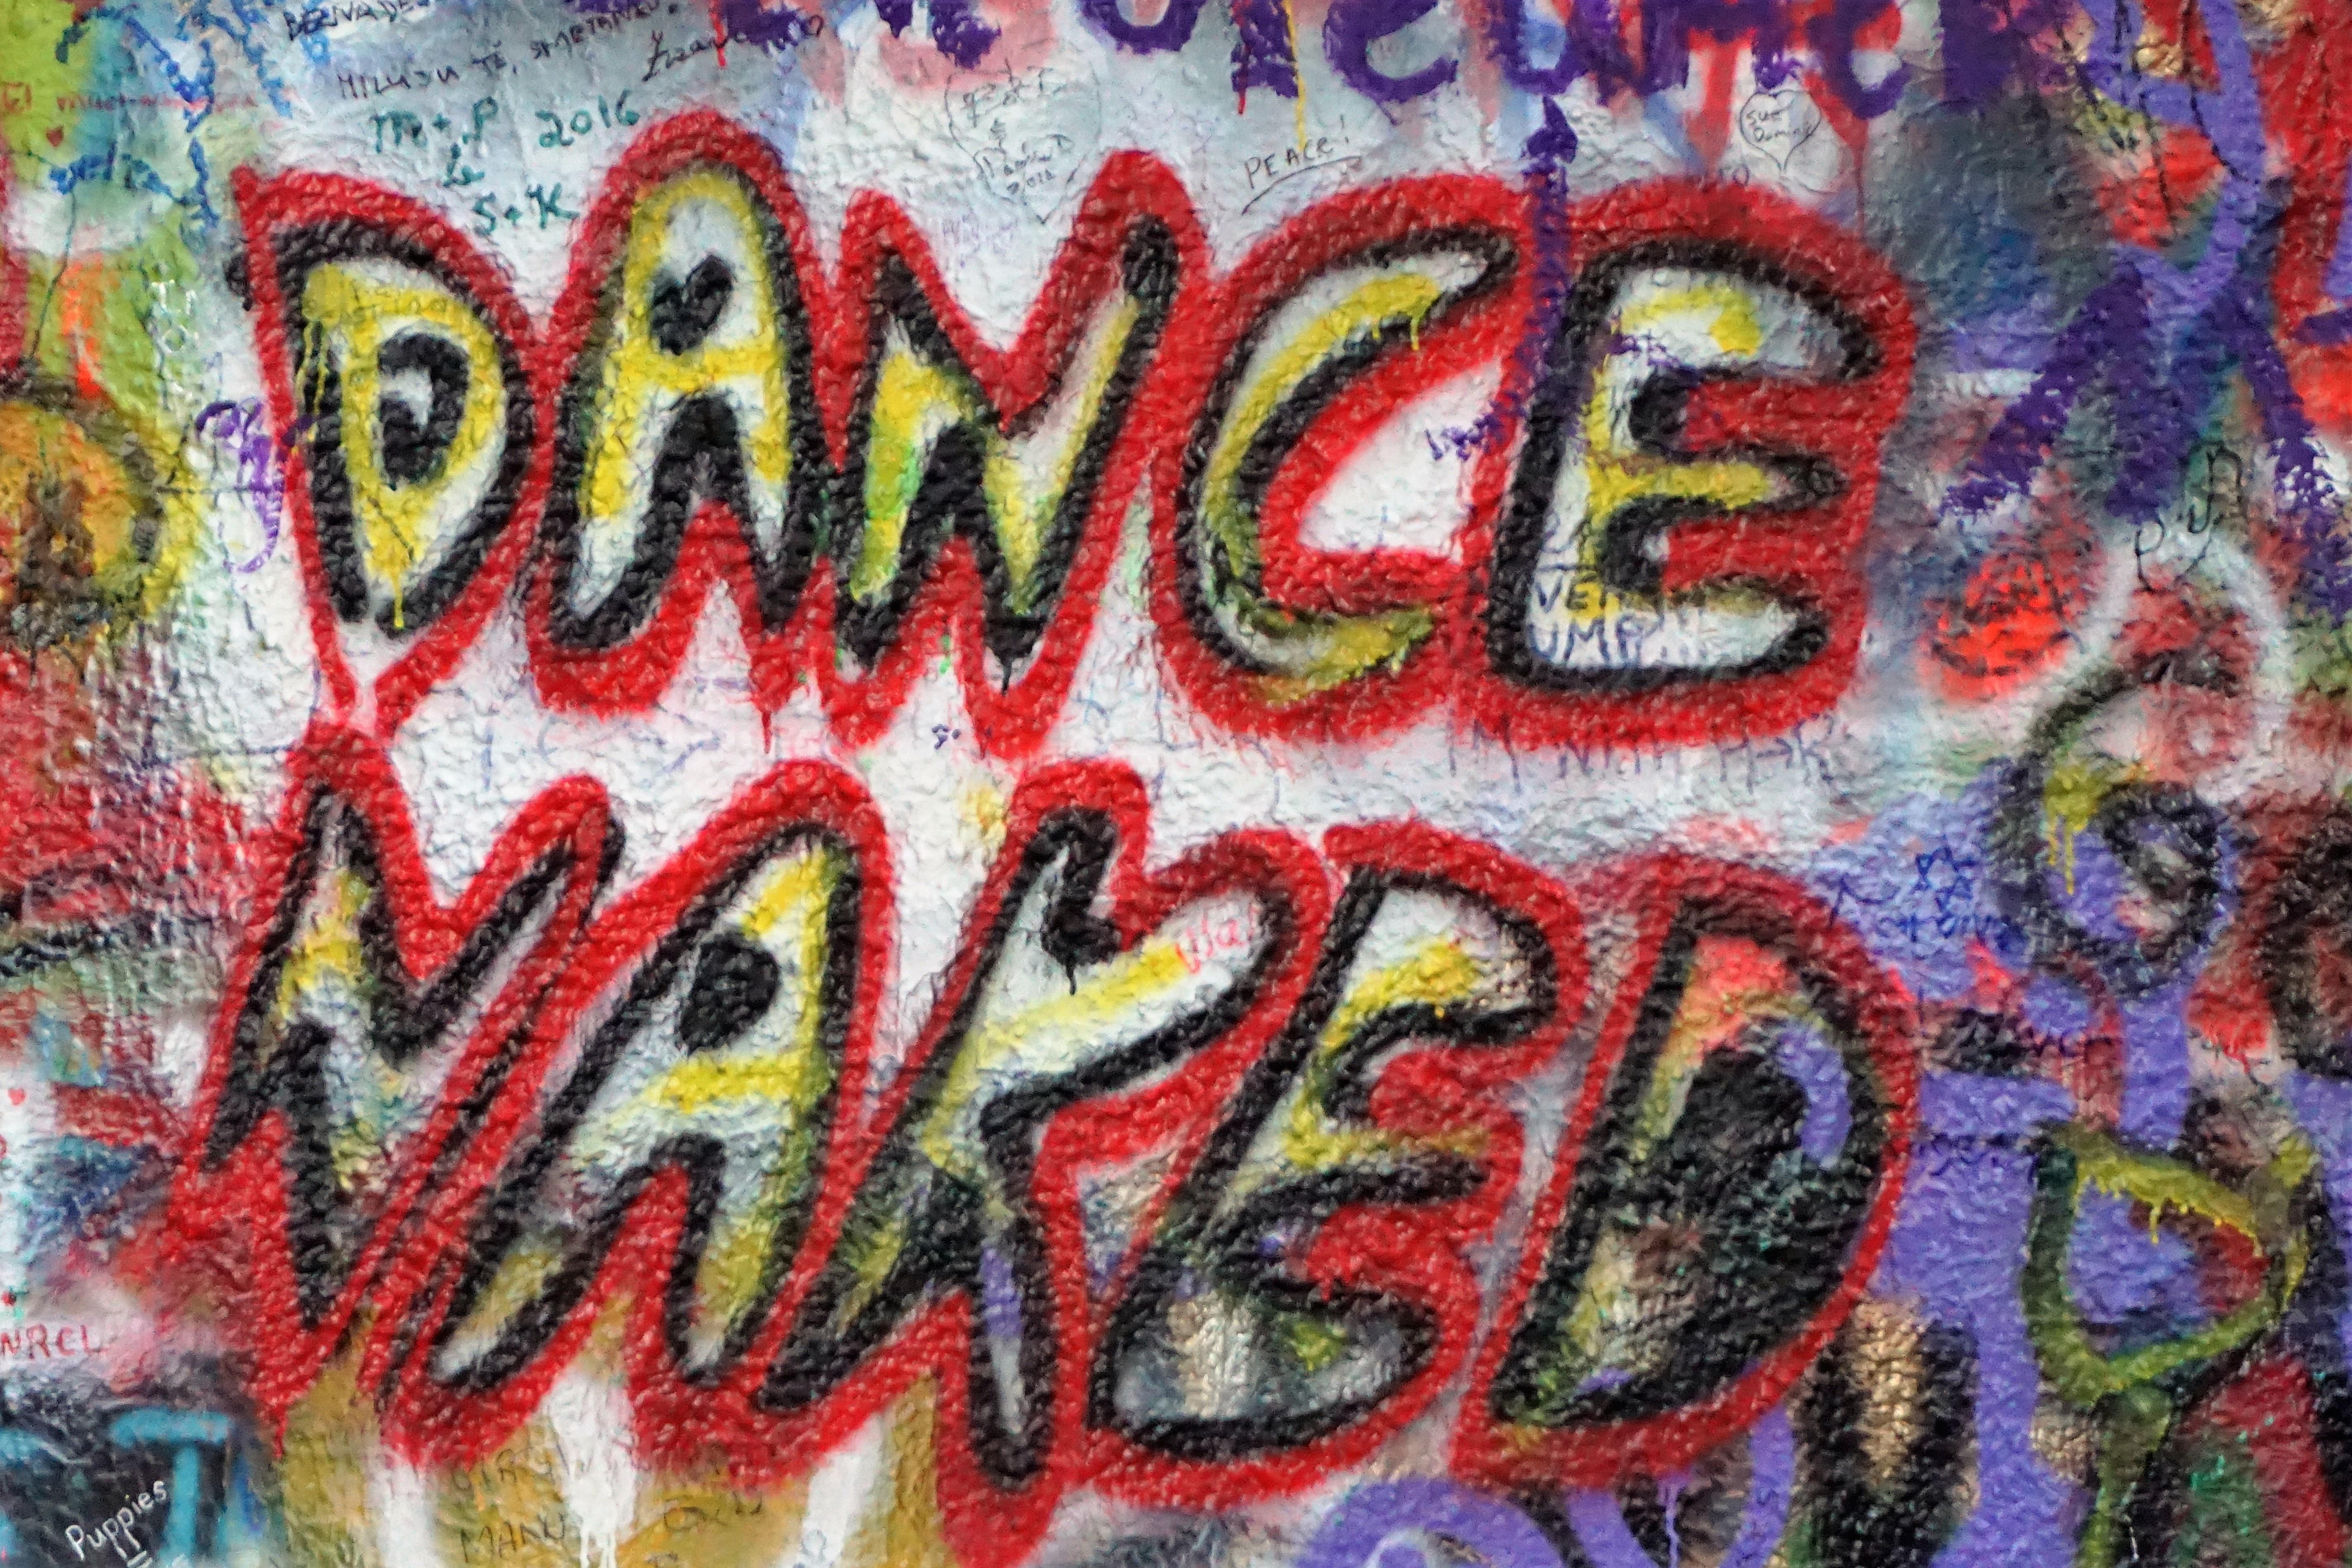 Dance prague graffiti font art naked grafitti john lennon wall